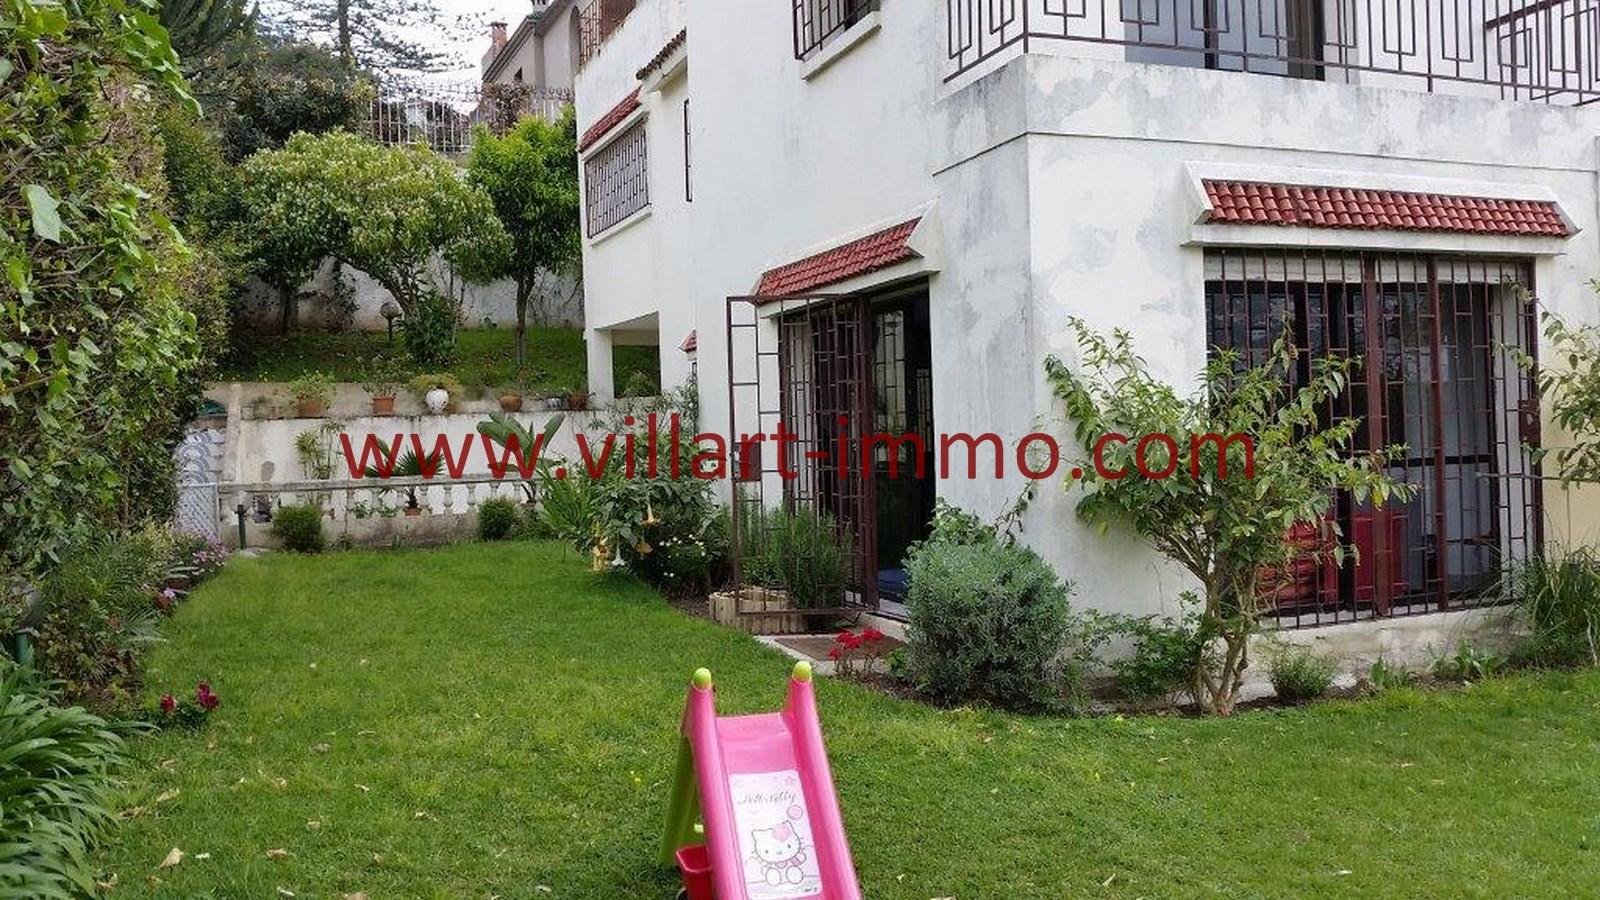 1-a-vendre-tanger-villa-californie-jardin-1-vv459-villart-immo-agence-immobiliere